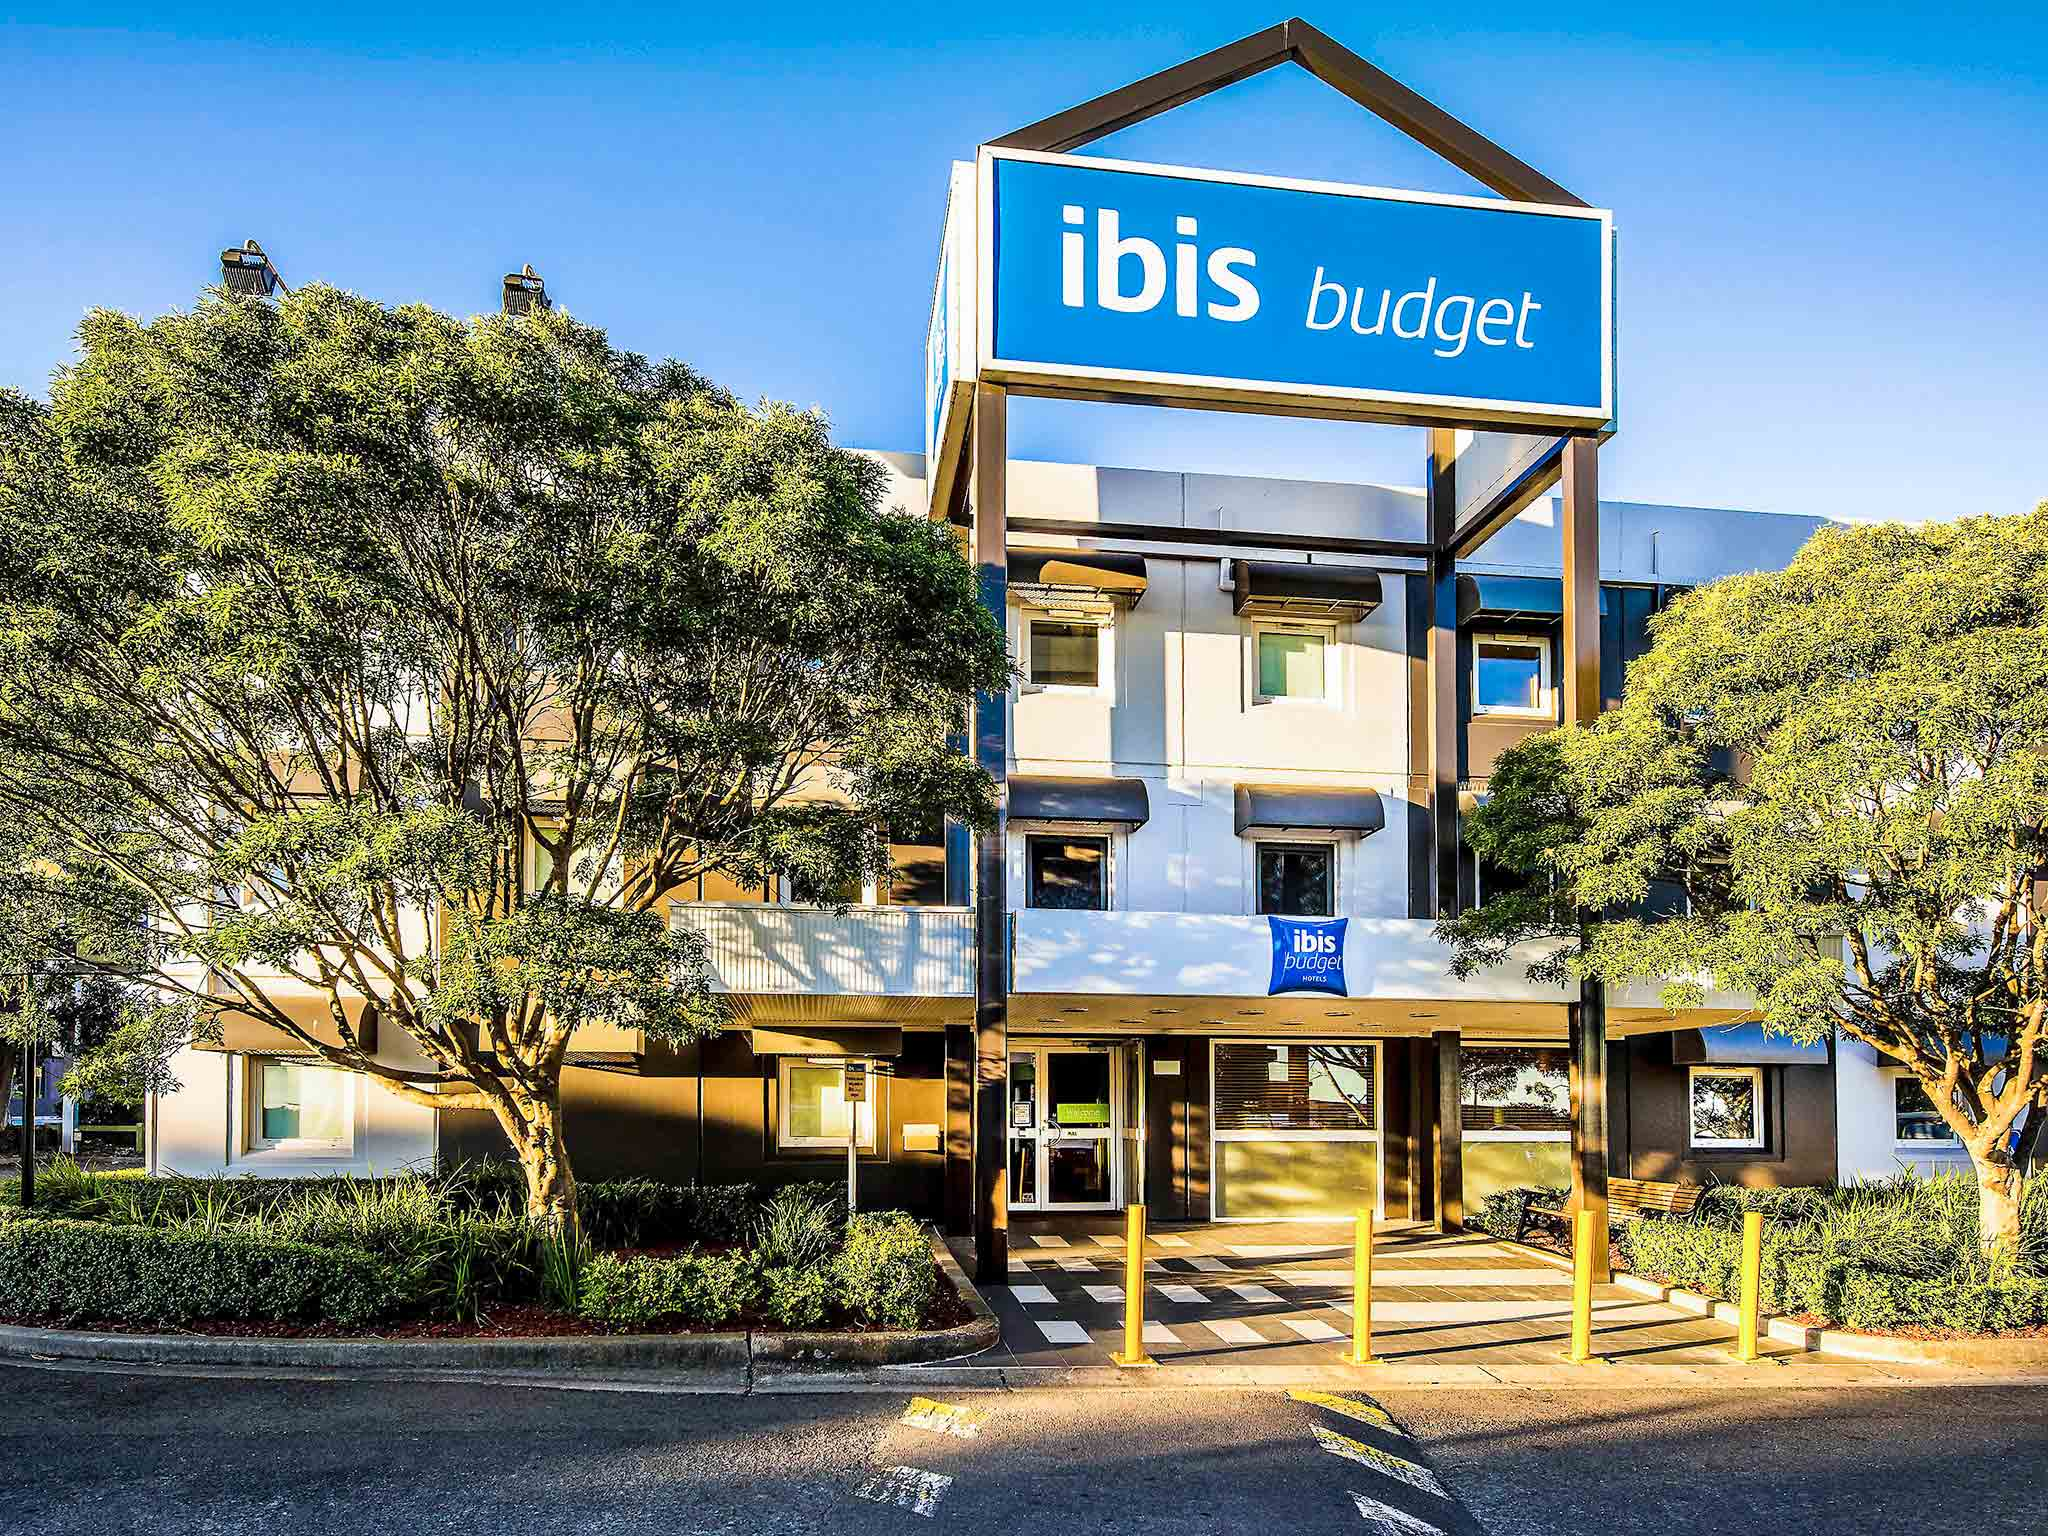 فندق - إيبيس بدجت ibis budget سانت بيترز